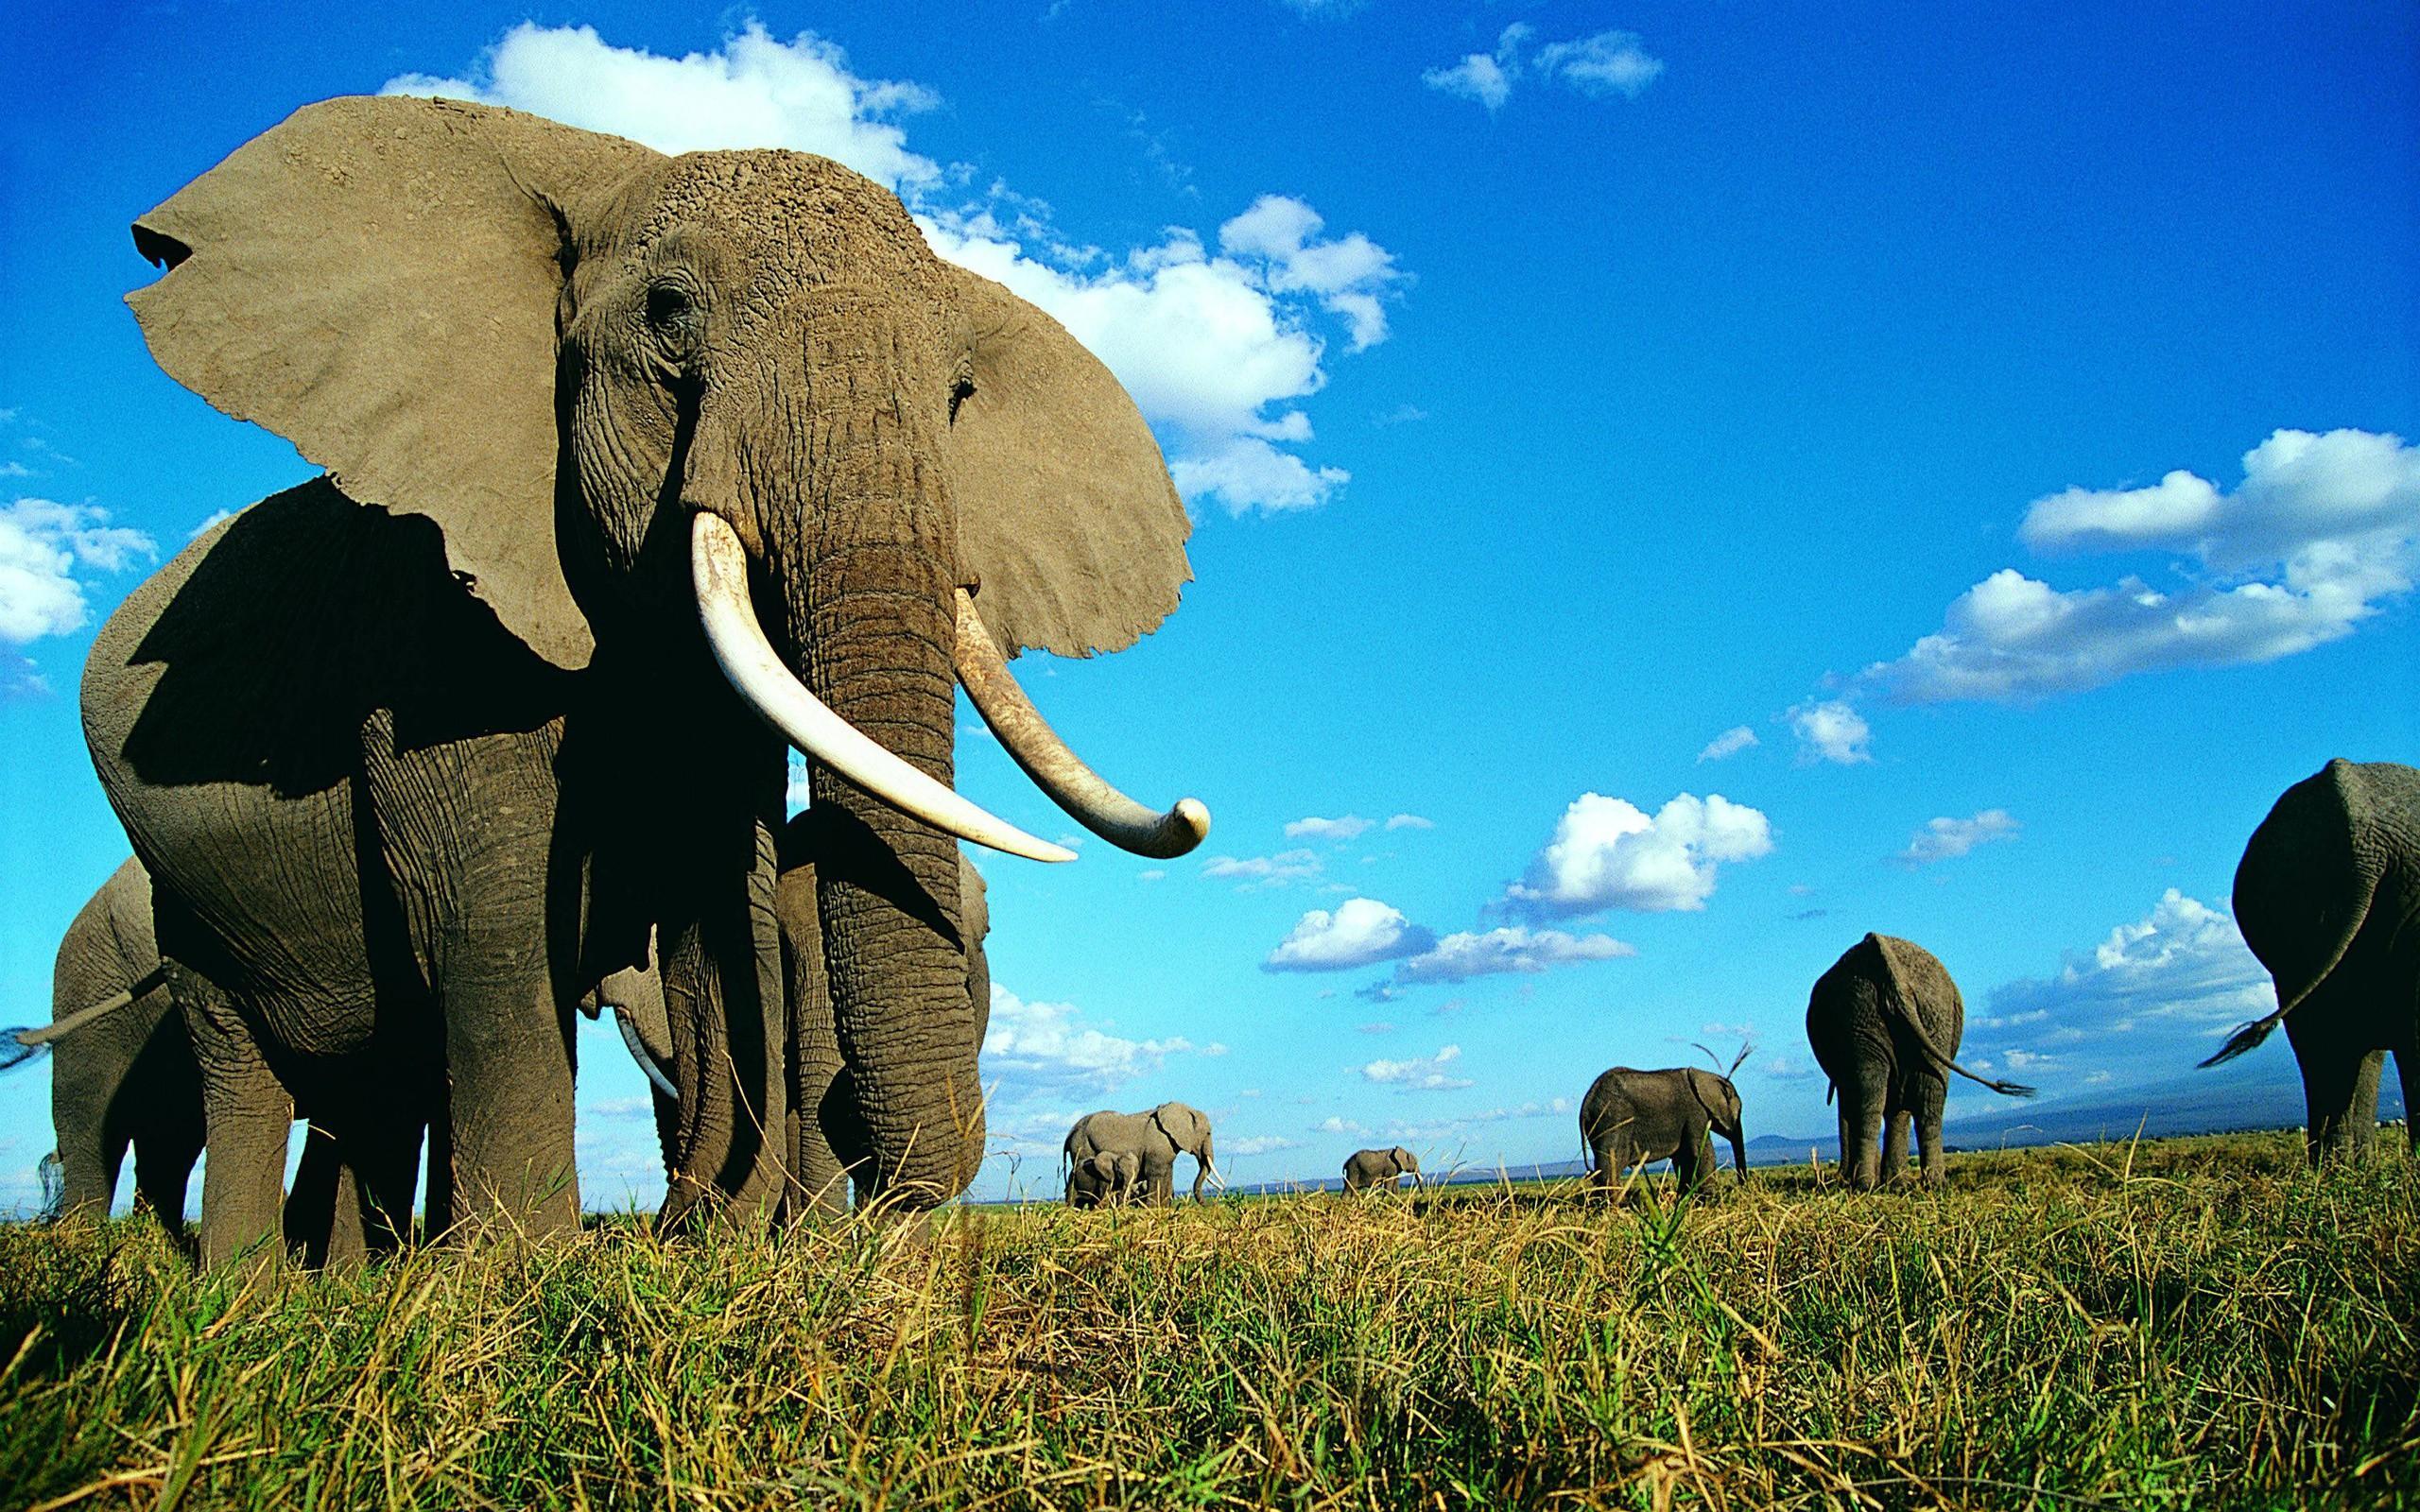 Wallpaper download elephant - Indian Elephant Wallpaper Which Is Under The Elephant Wallpapers